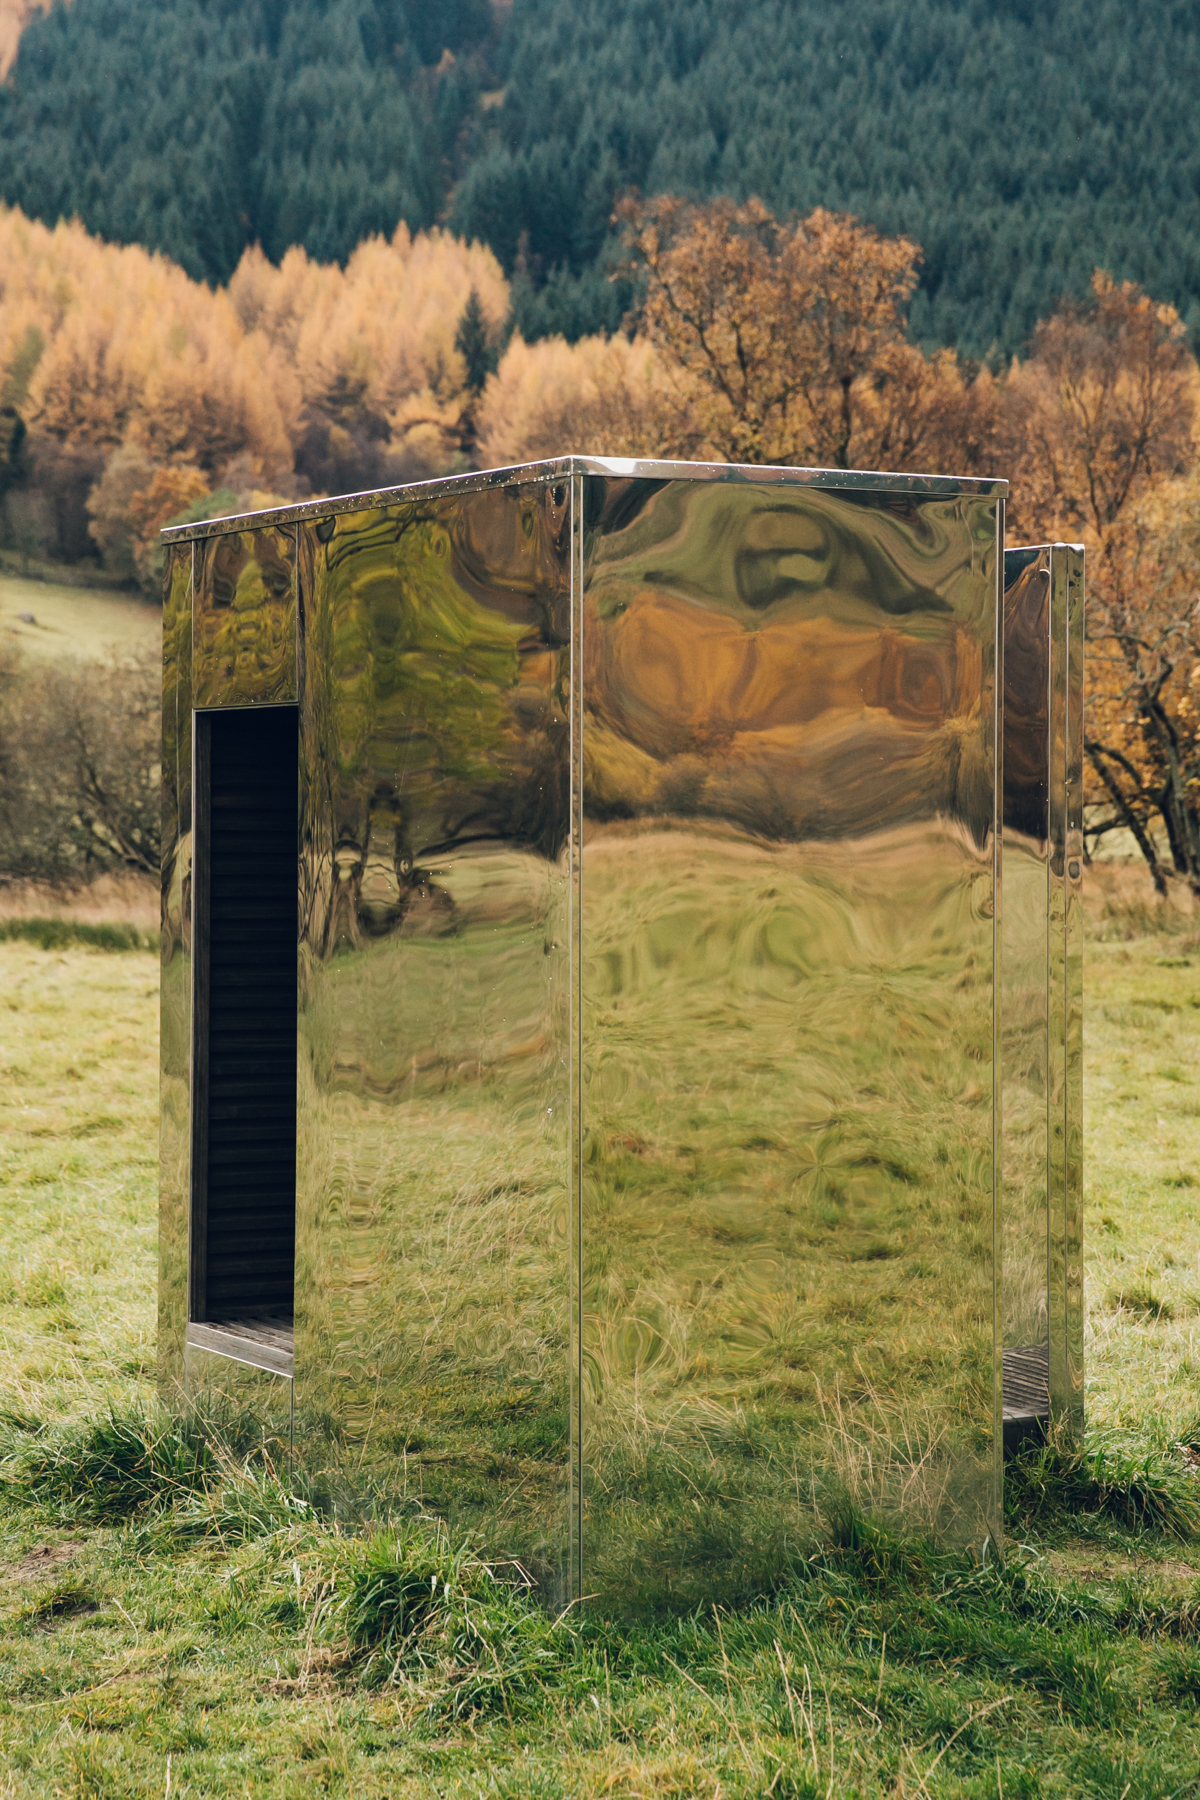 Mirrored cabin in Scotland in Autumn.